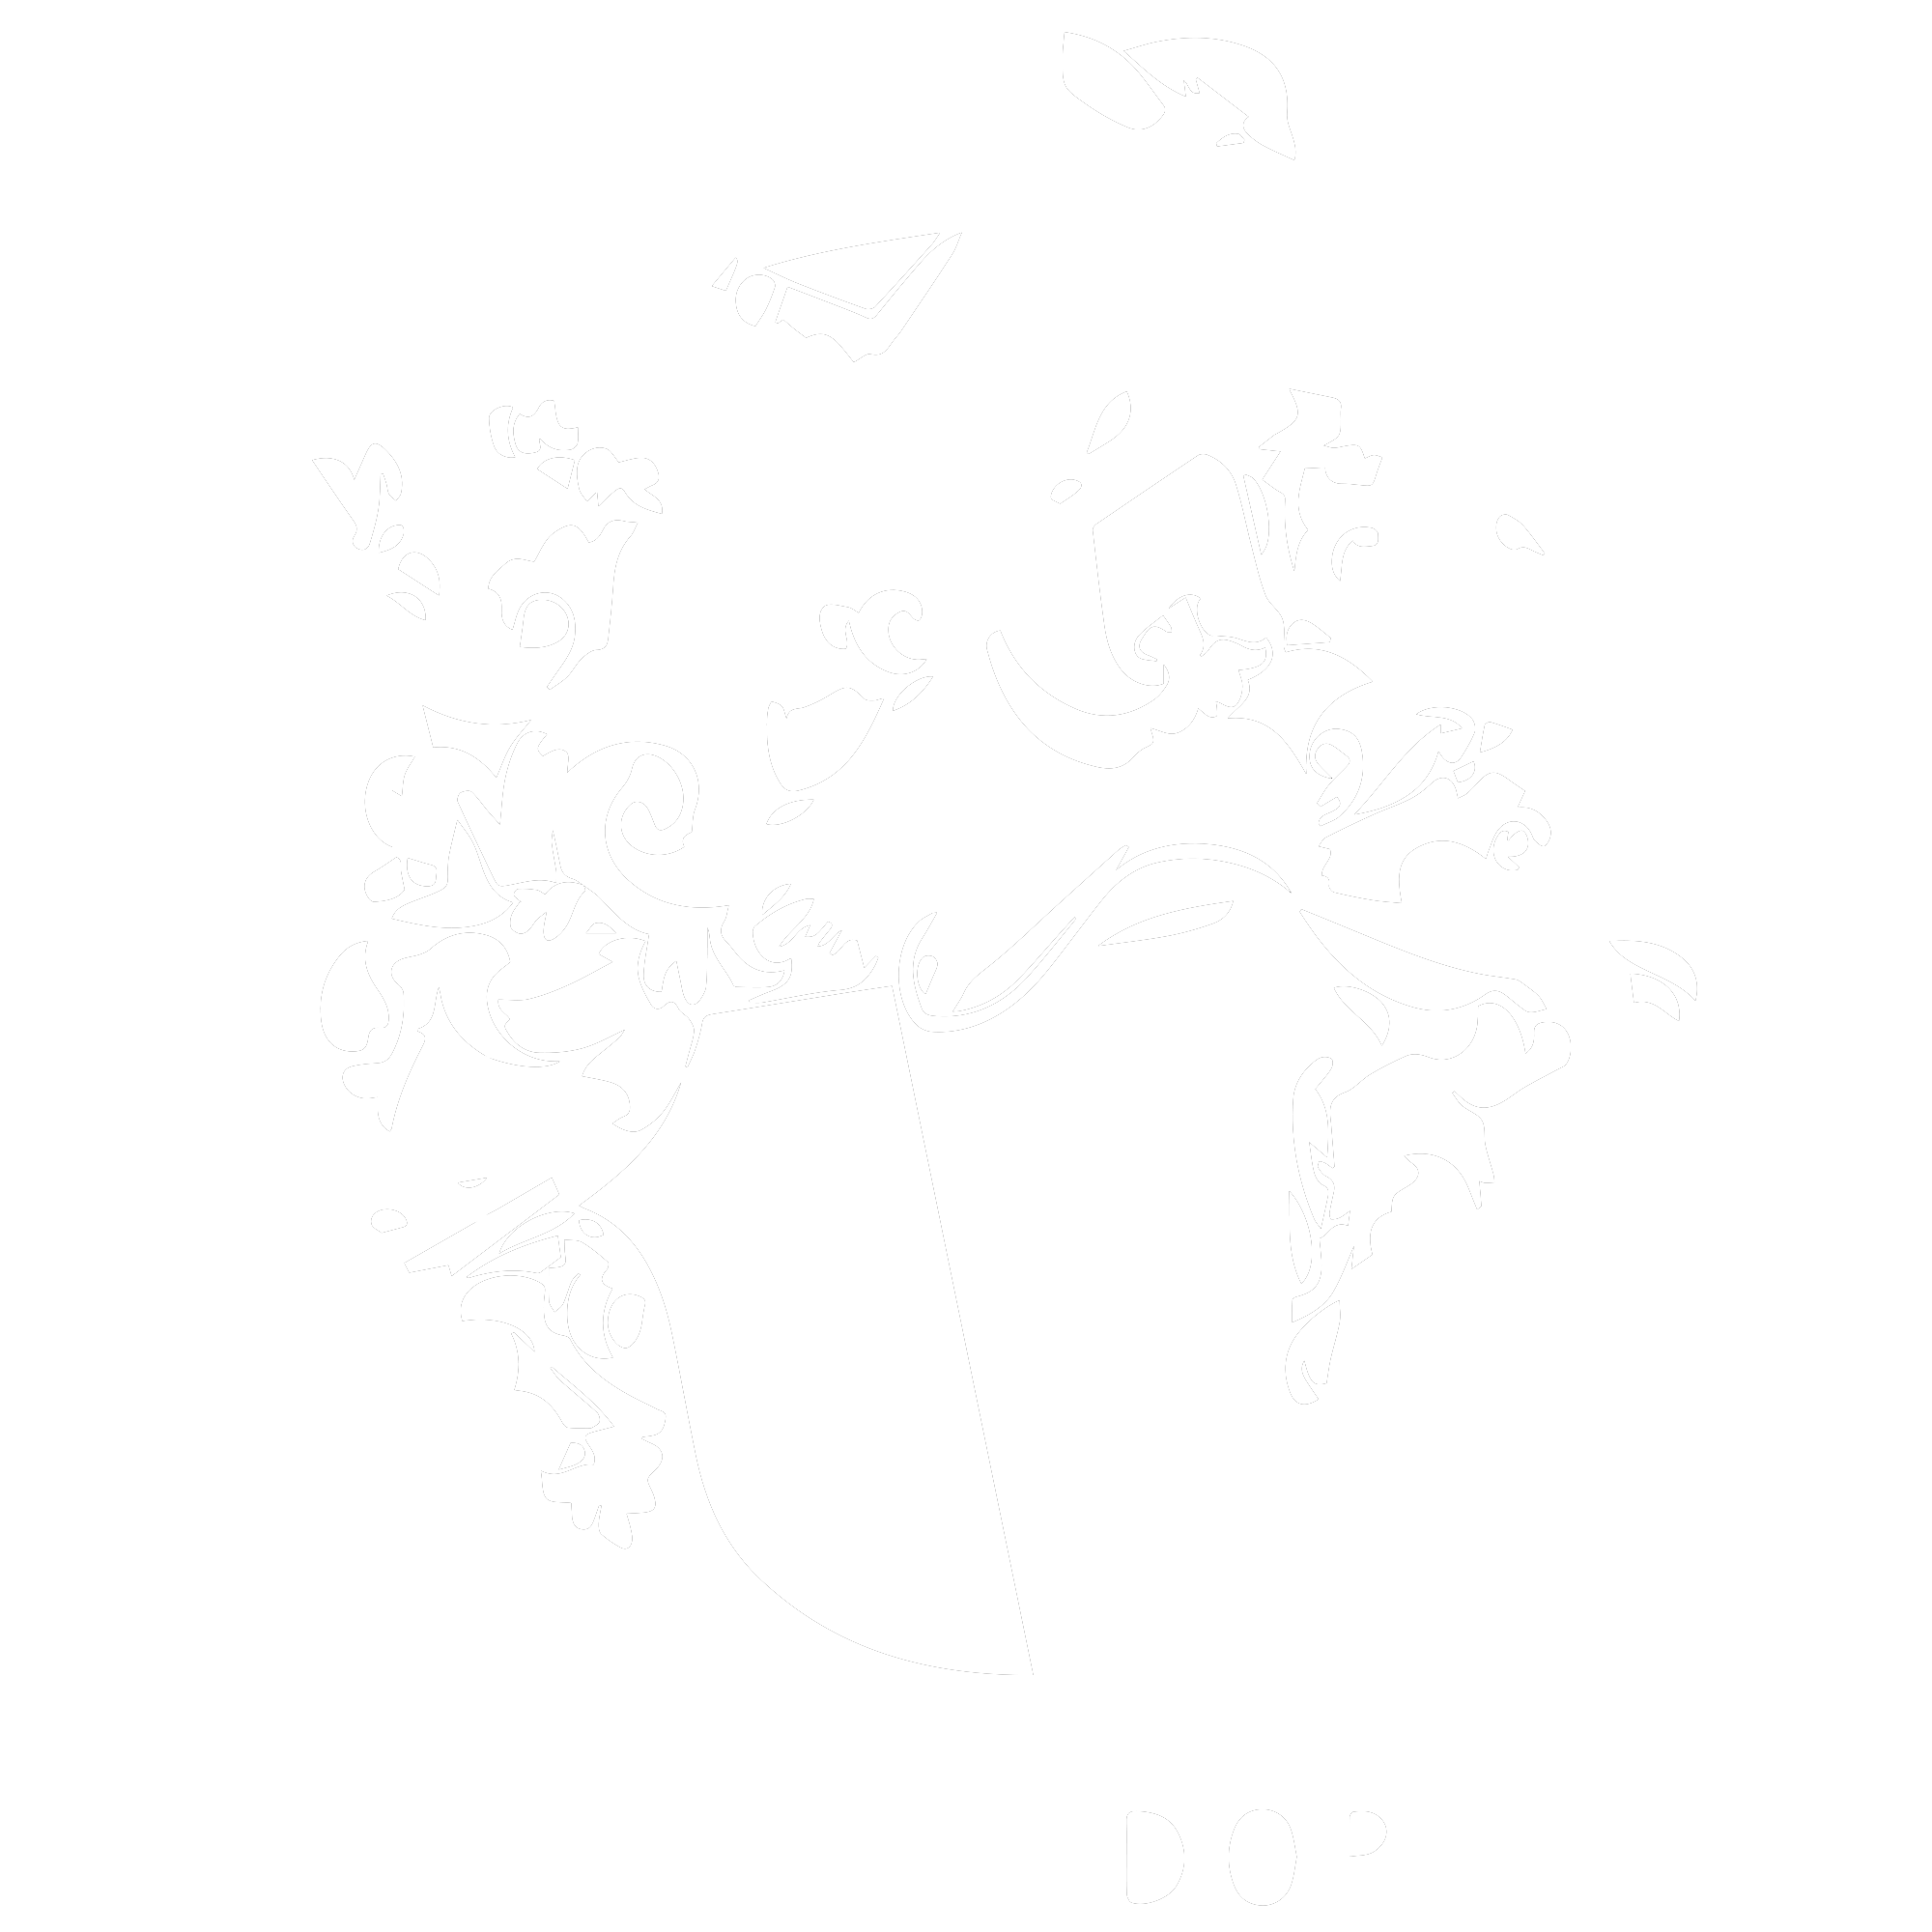 Wertstoffhof Michelsneukirchen